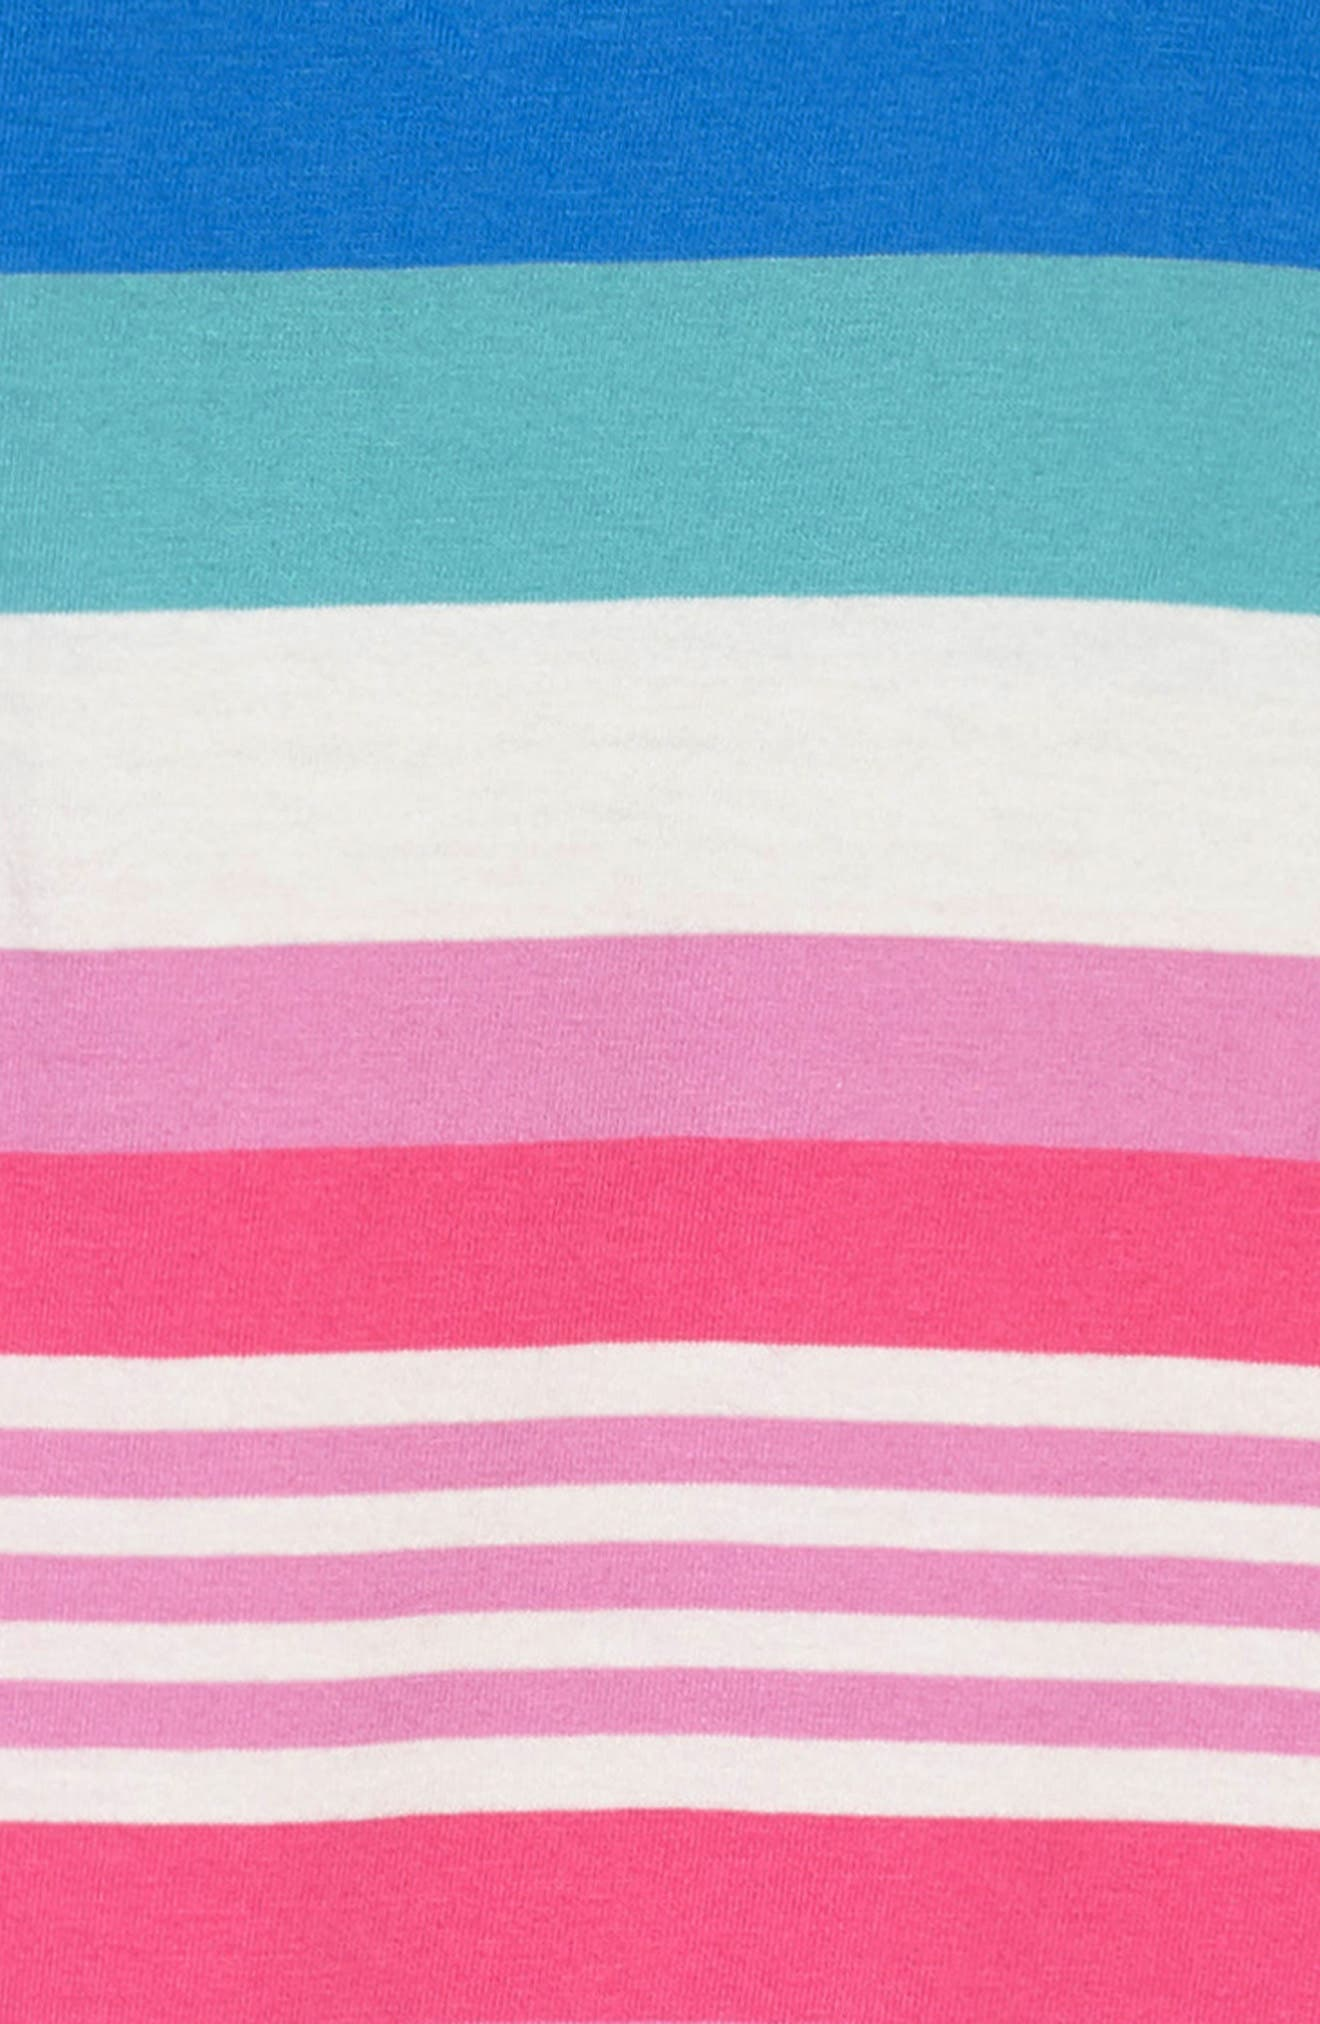 Alternate Image 3  - Tea Collection Summer Dress (Toddler Girls, Little Girls & Big Girls)